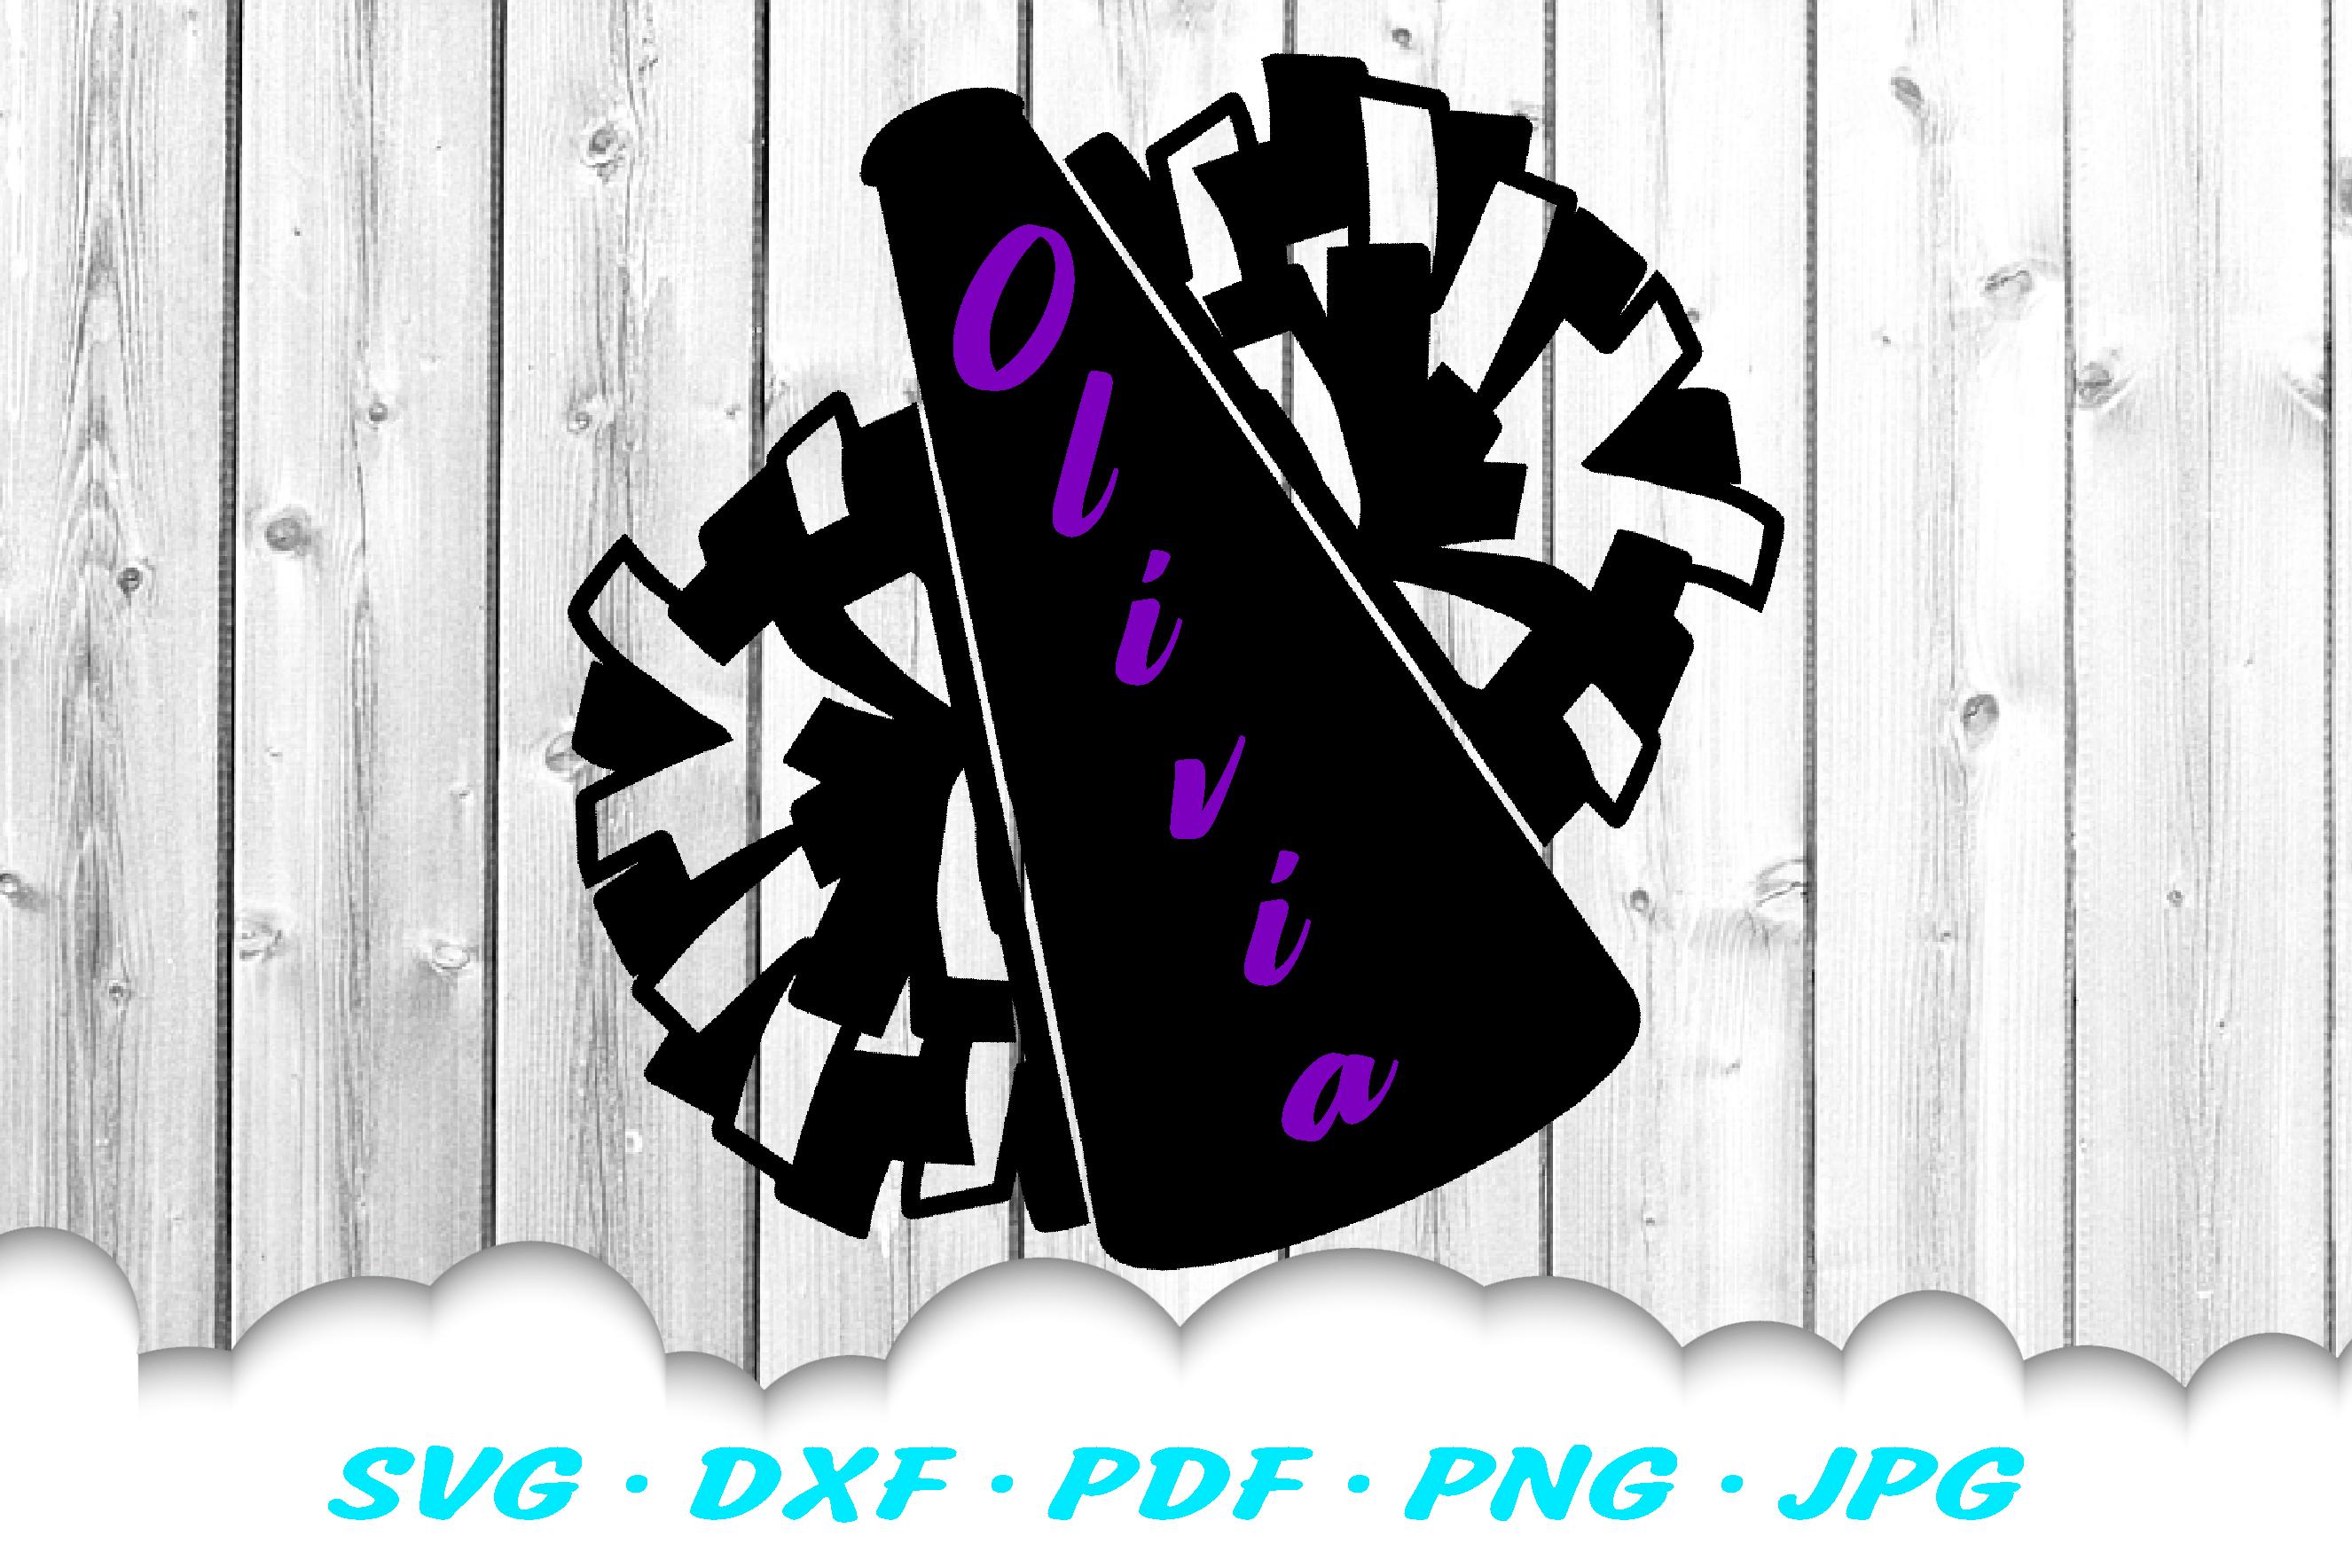 Cheerleader Cheer Megaphone Poms SVG DXF Cut Files example image 1